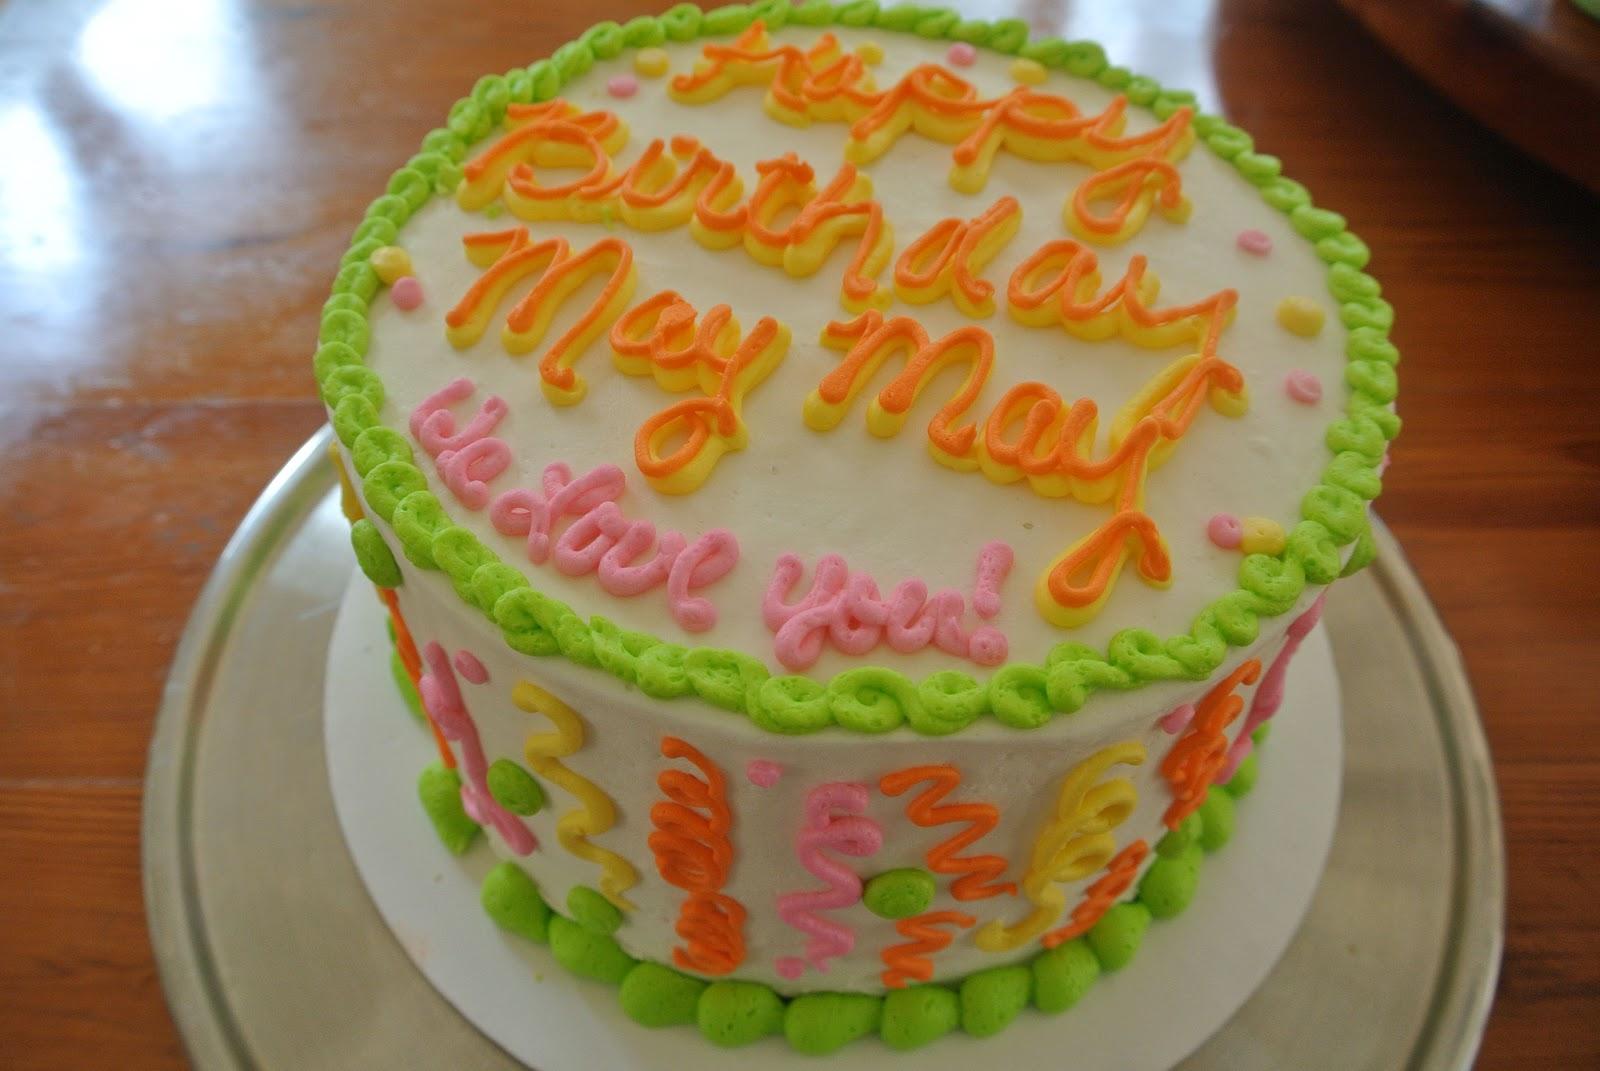 Soli Deo Gloria Celebrate with cake